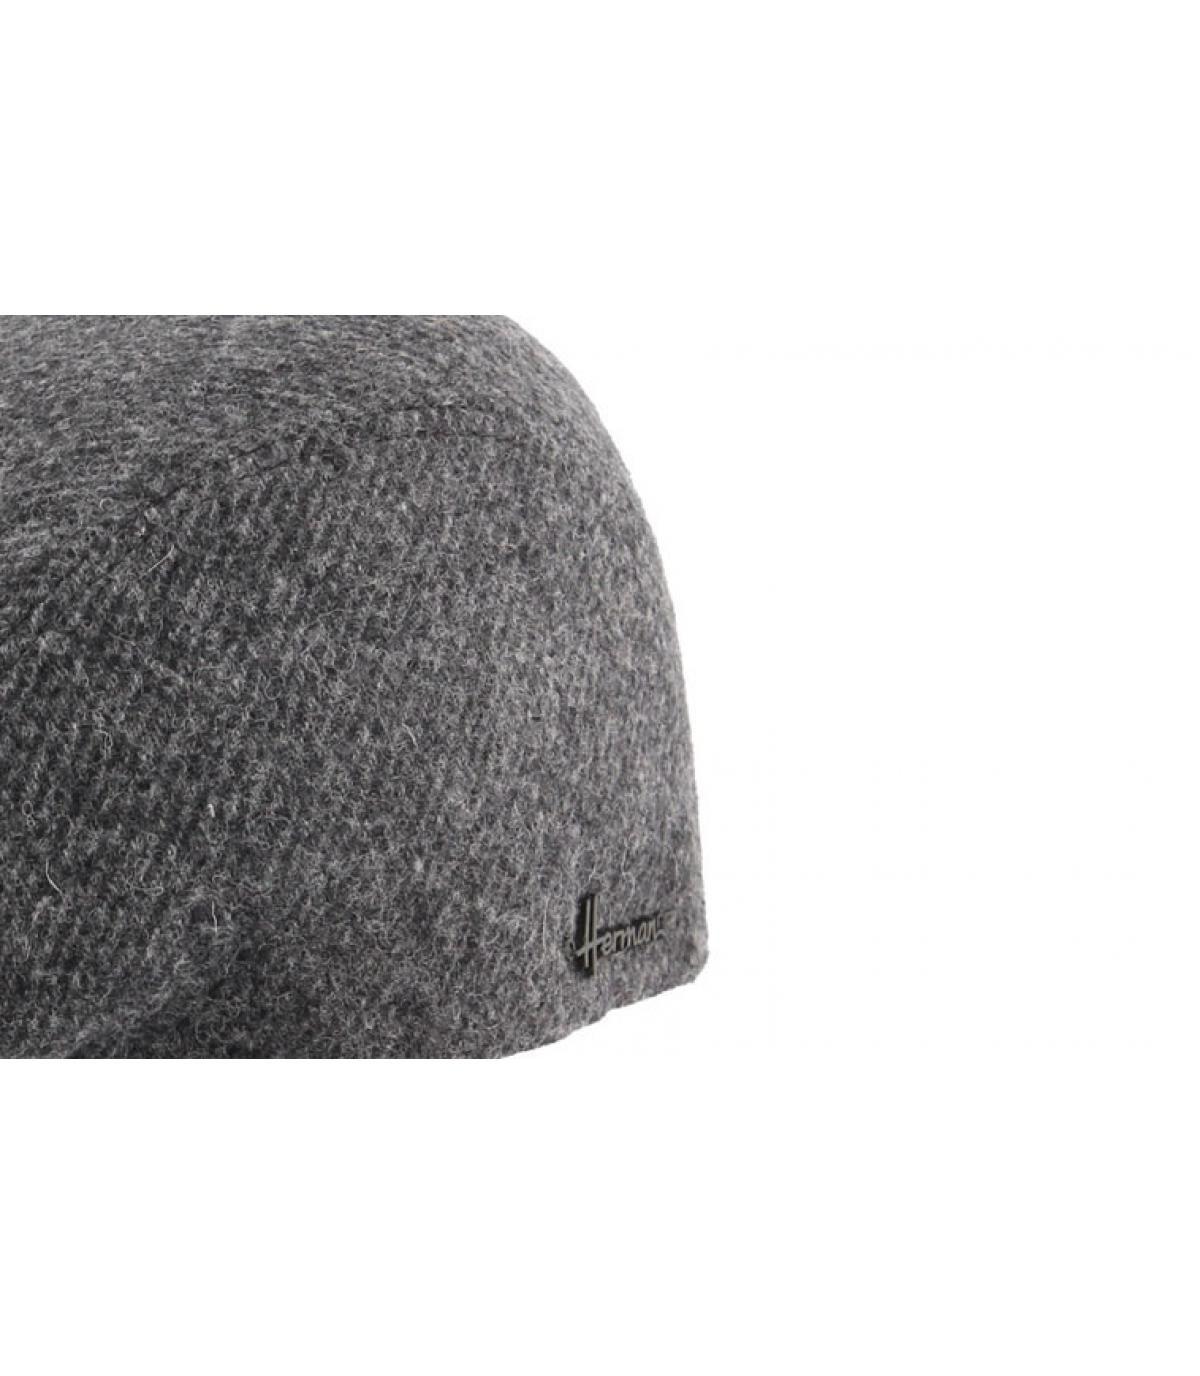 Détails Hill wool EF grey - image 3